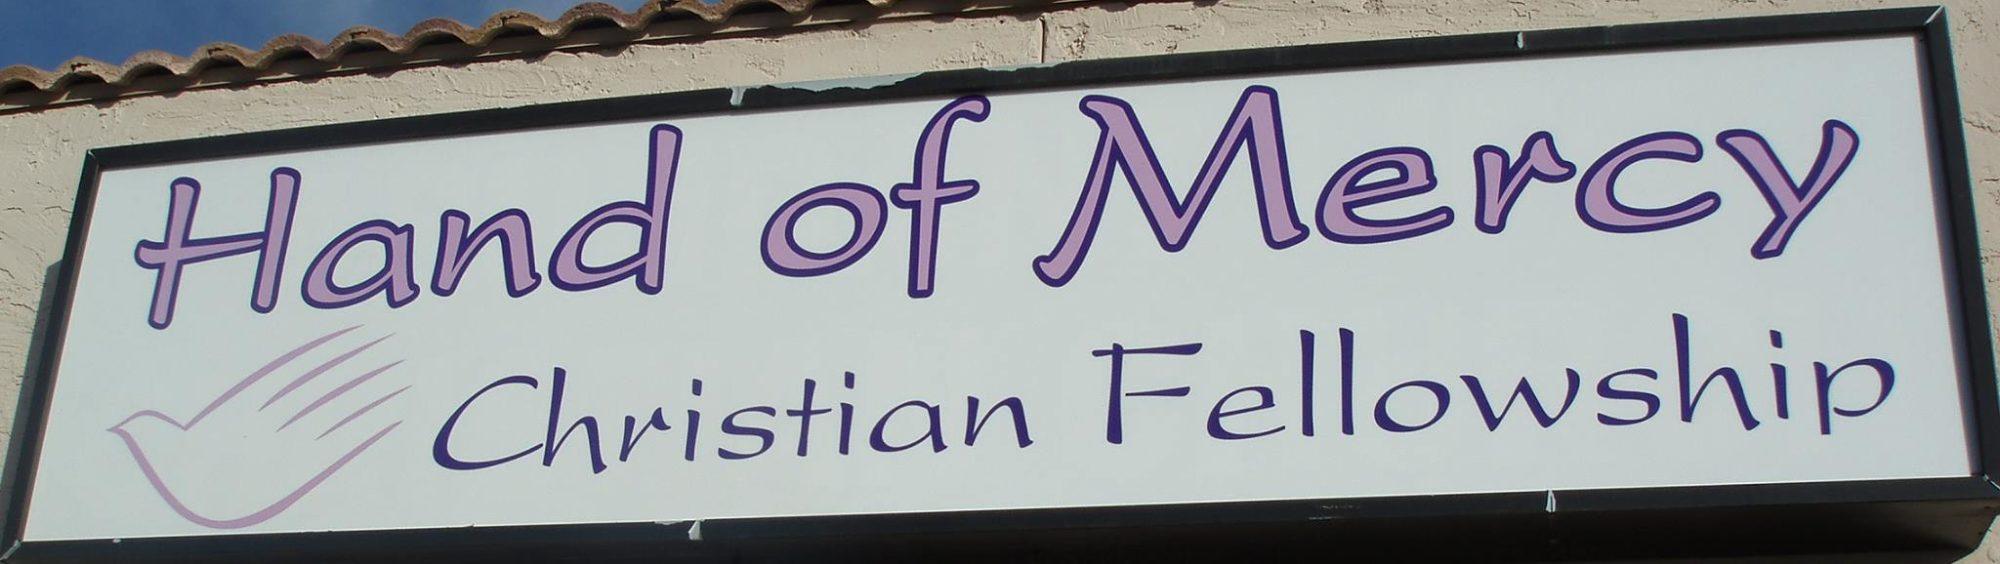 Hand of Mercy Christian Fellowship